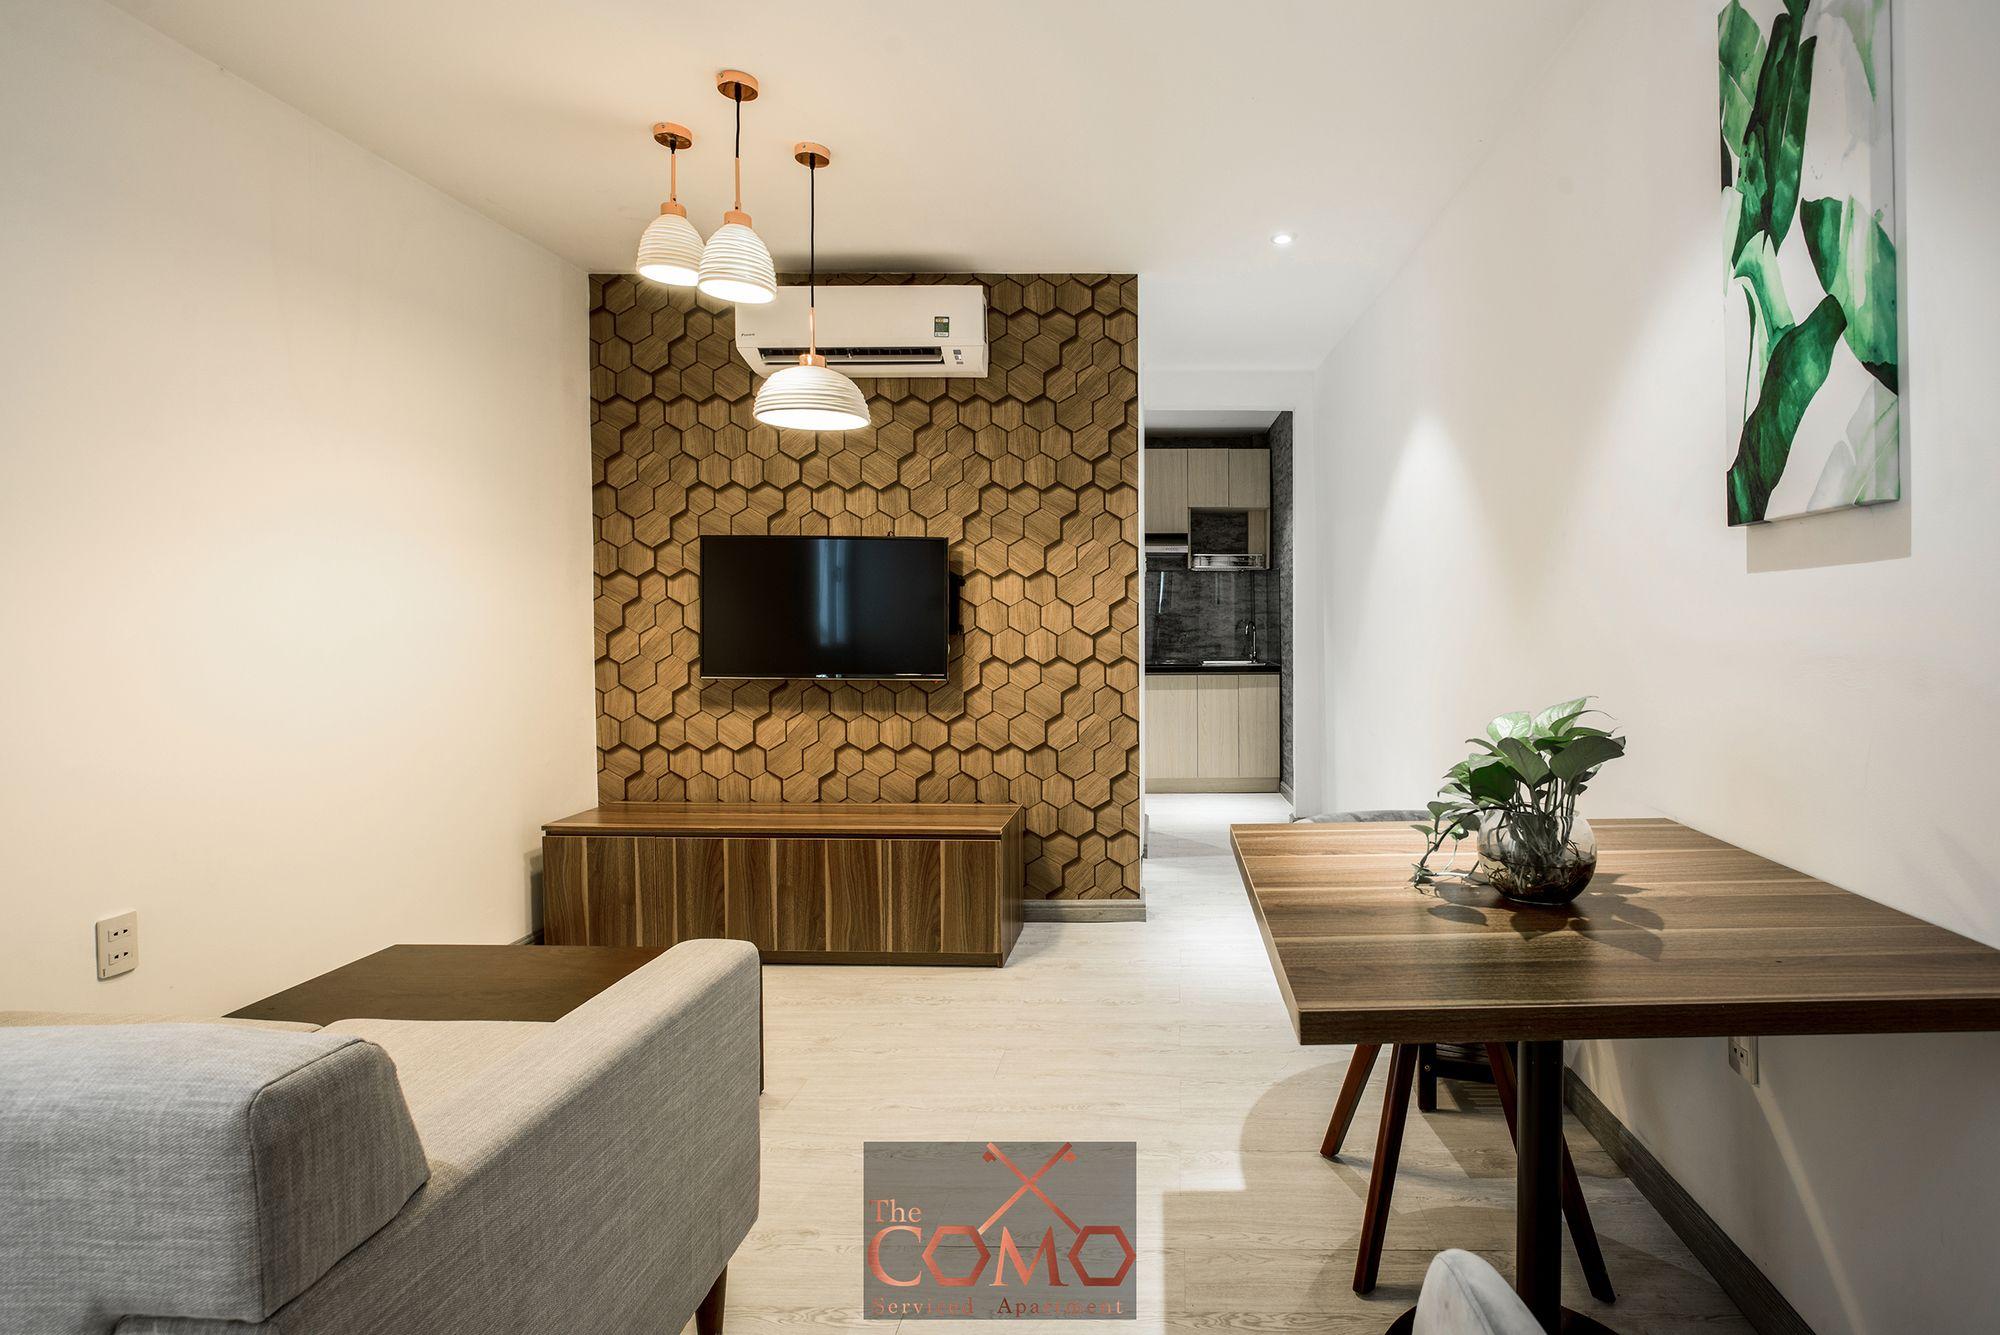 The Como Le Lai Central Apartment